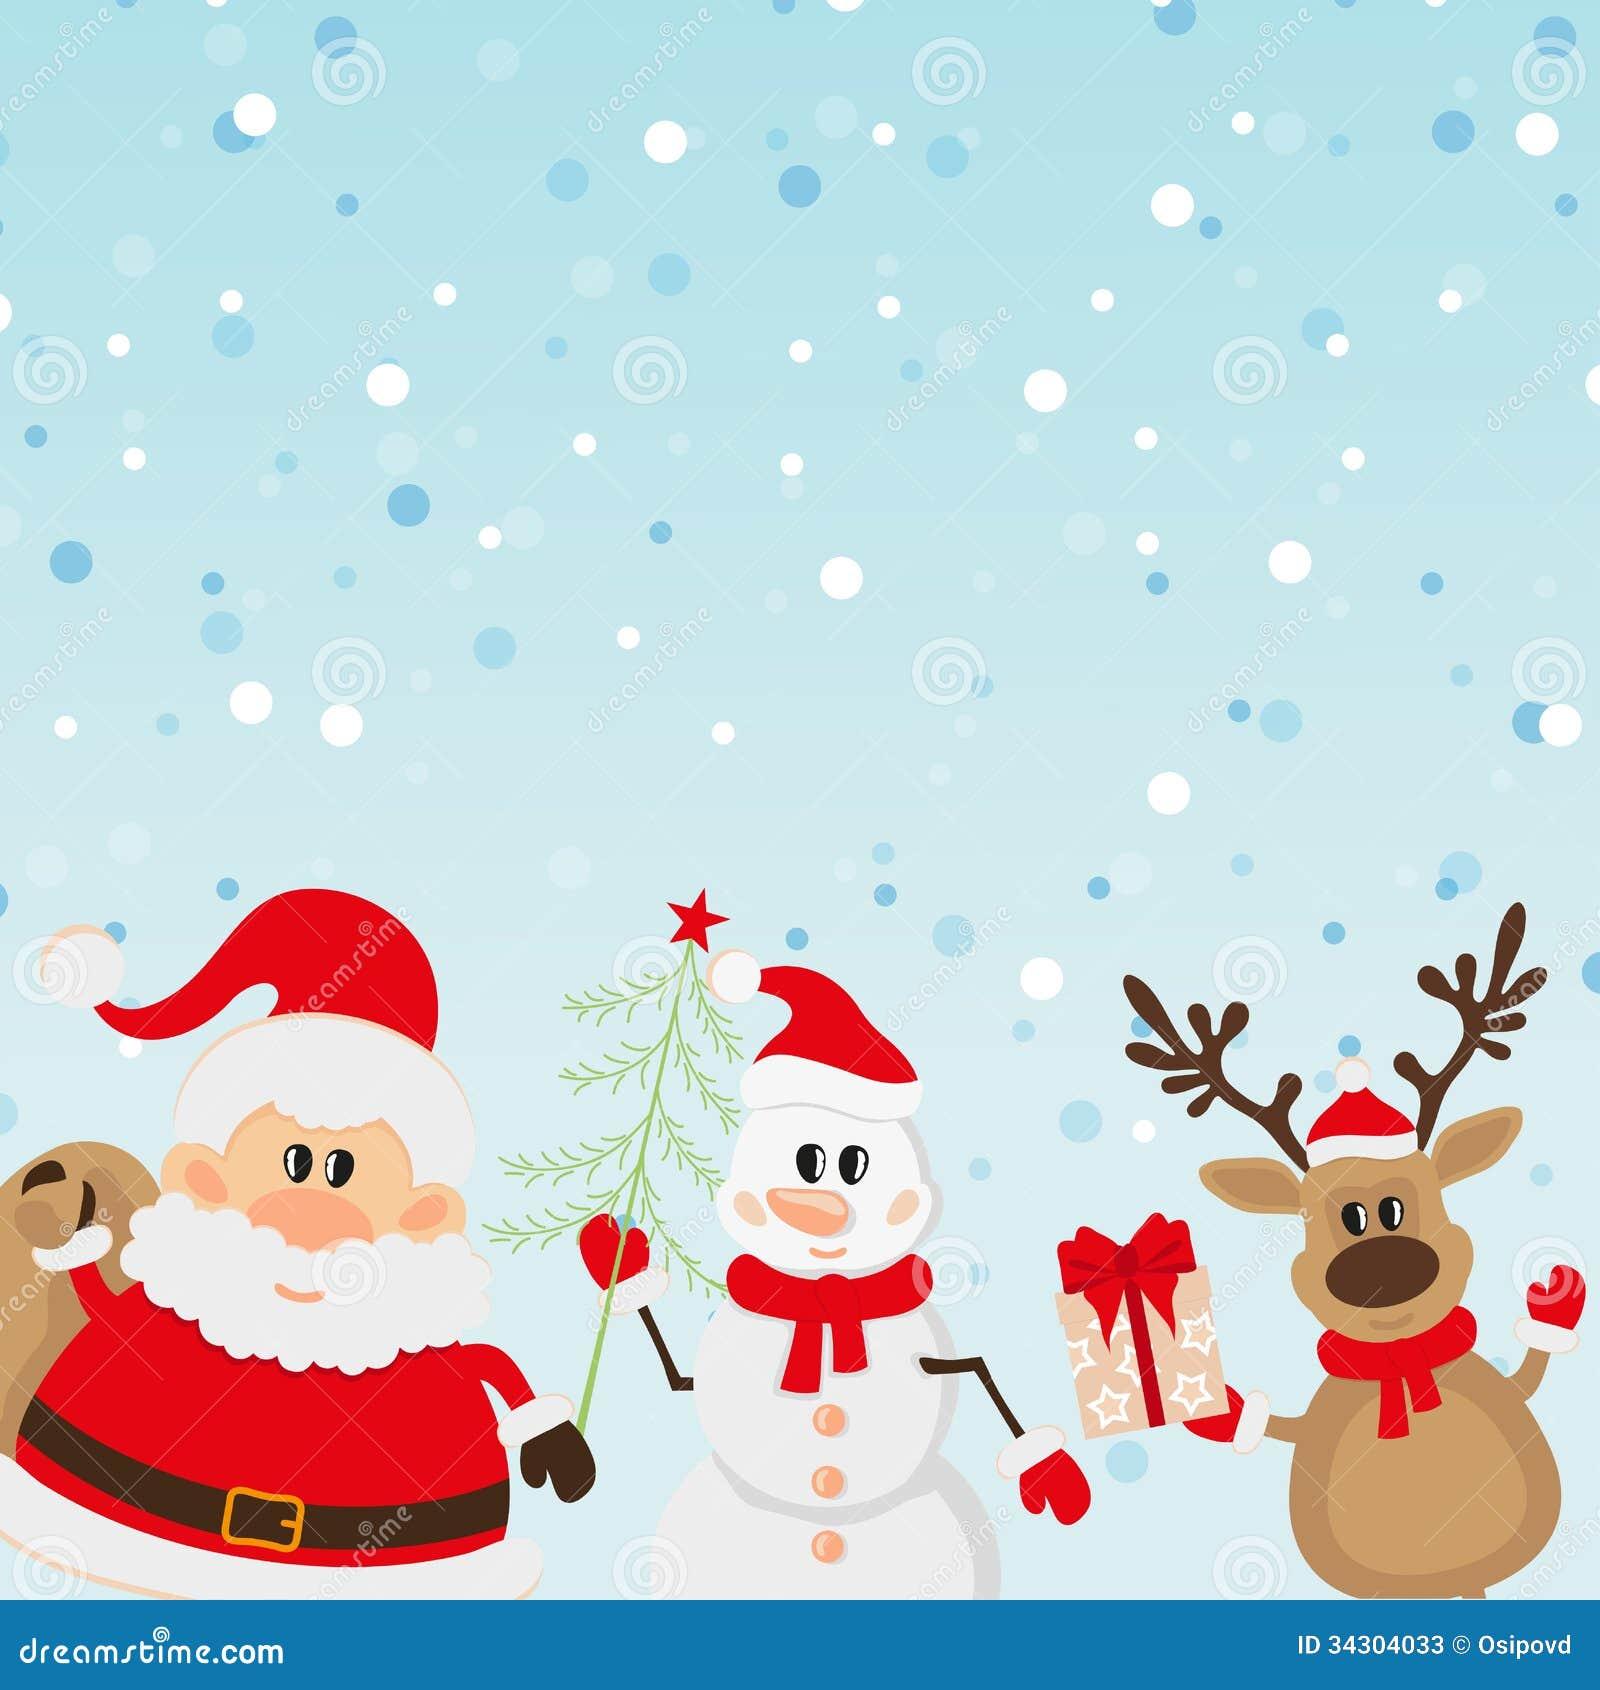 Santa claus reindeer snowman background stock photos image